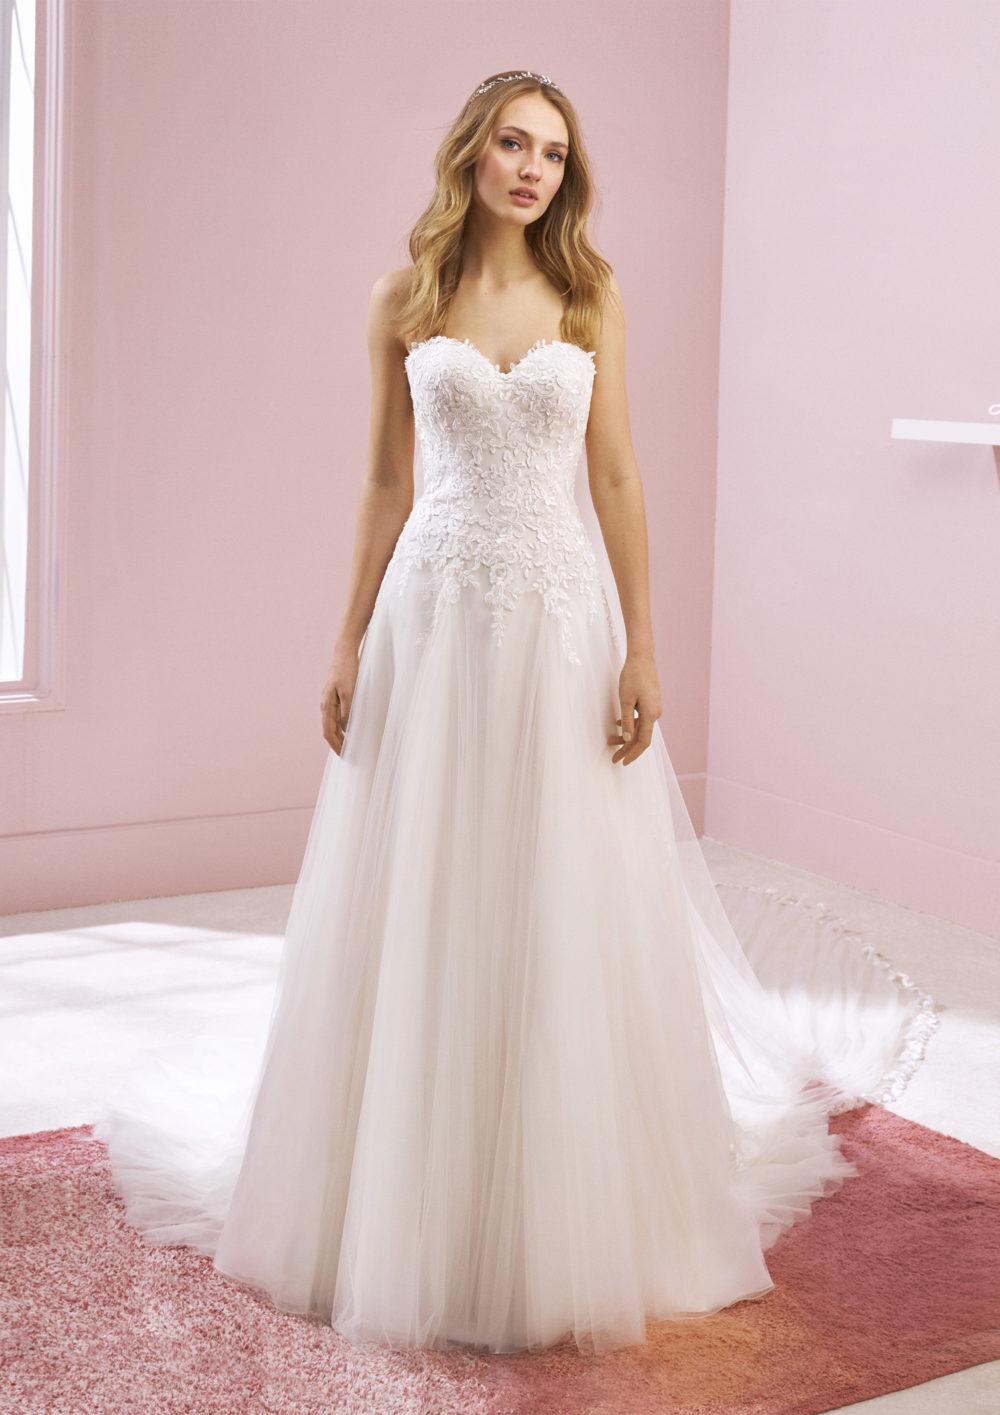 MMariages: abito da sposa Poème 2020 a Vicenza, Verona, Padova, Veneto KELSEY